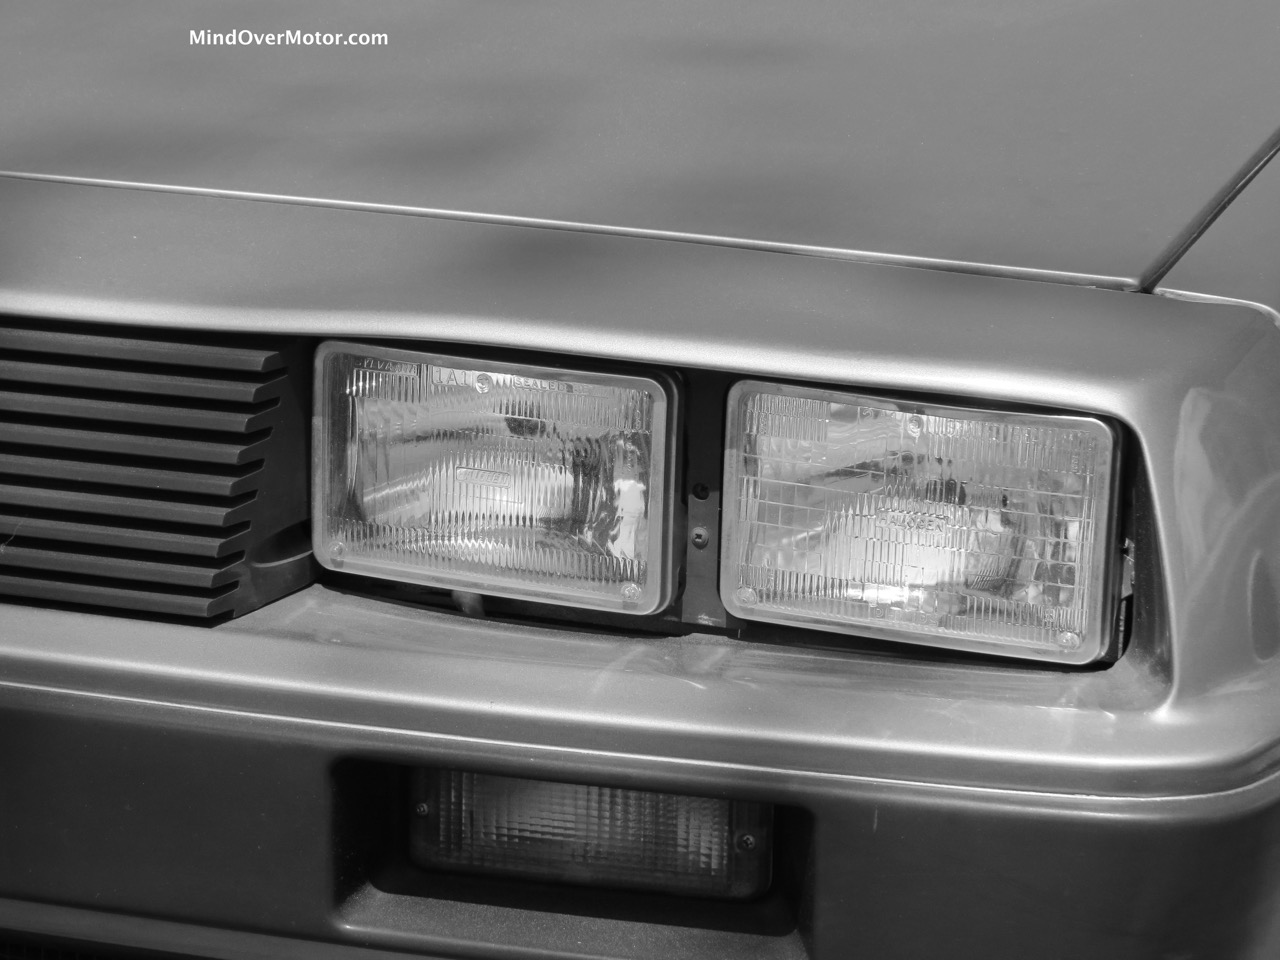 Turbocharged Delorean Lights